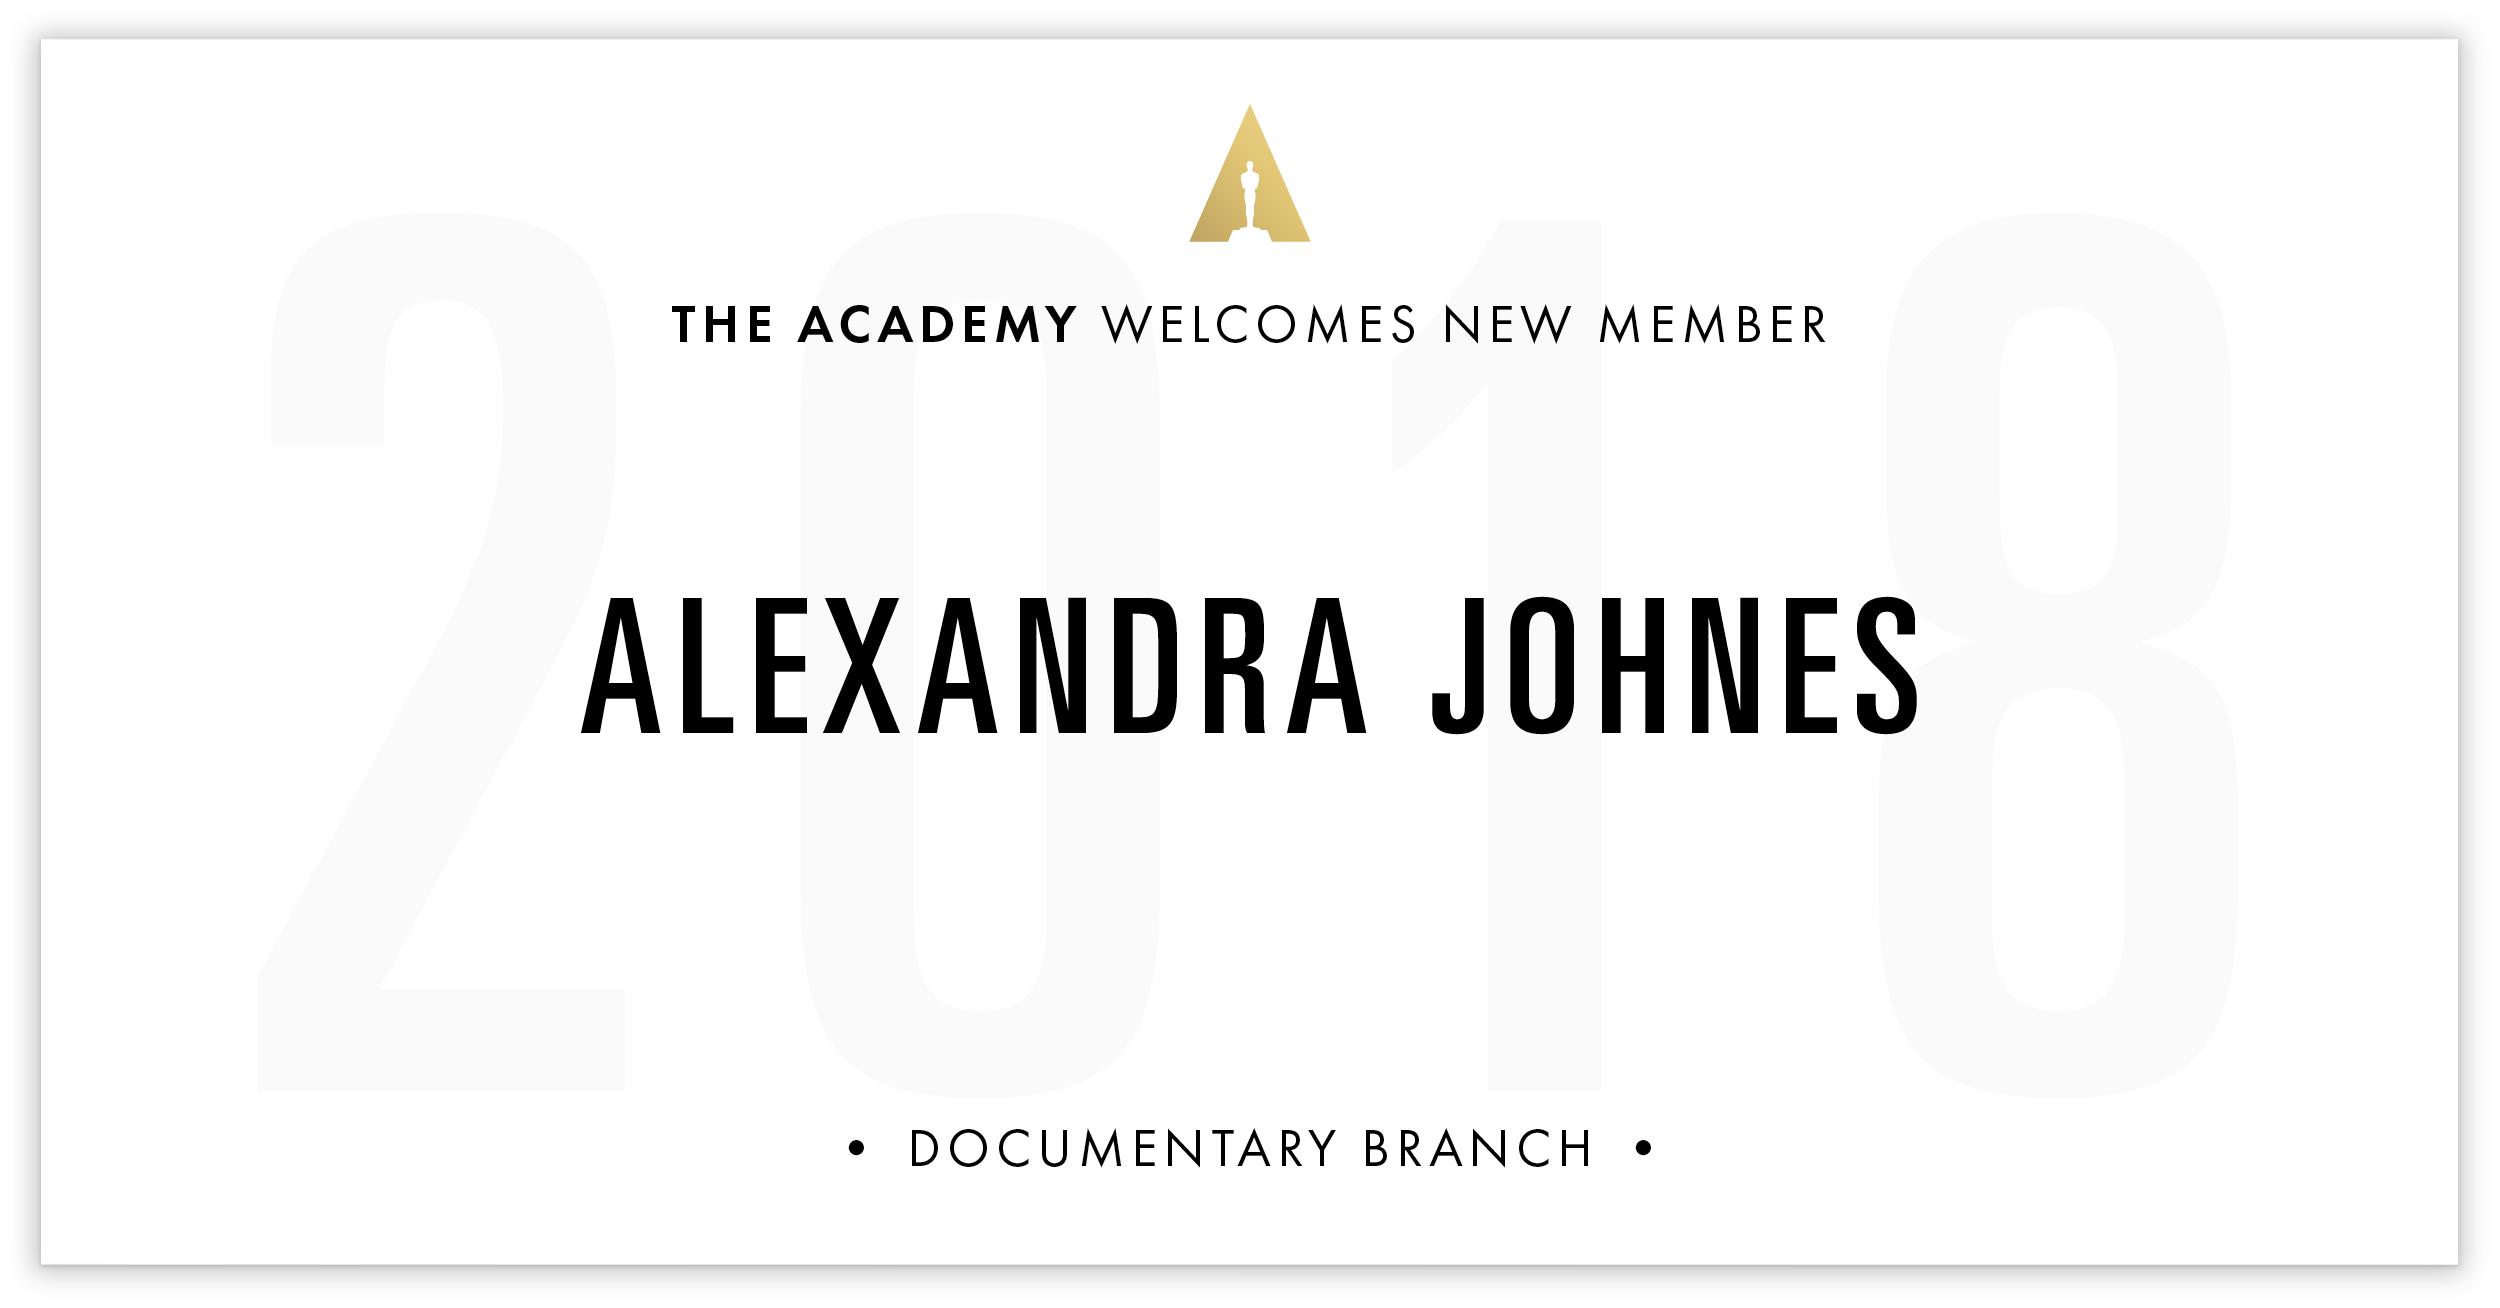 Alexandra Johnes is invited!